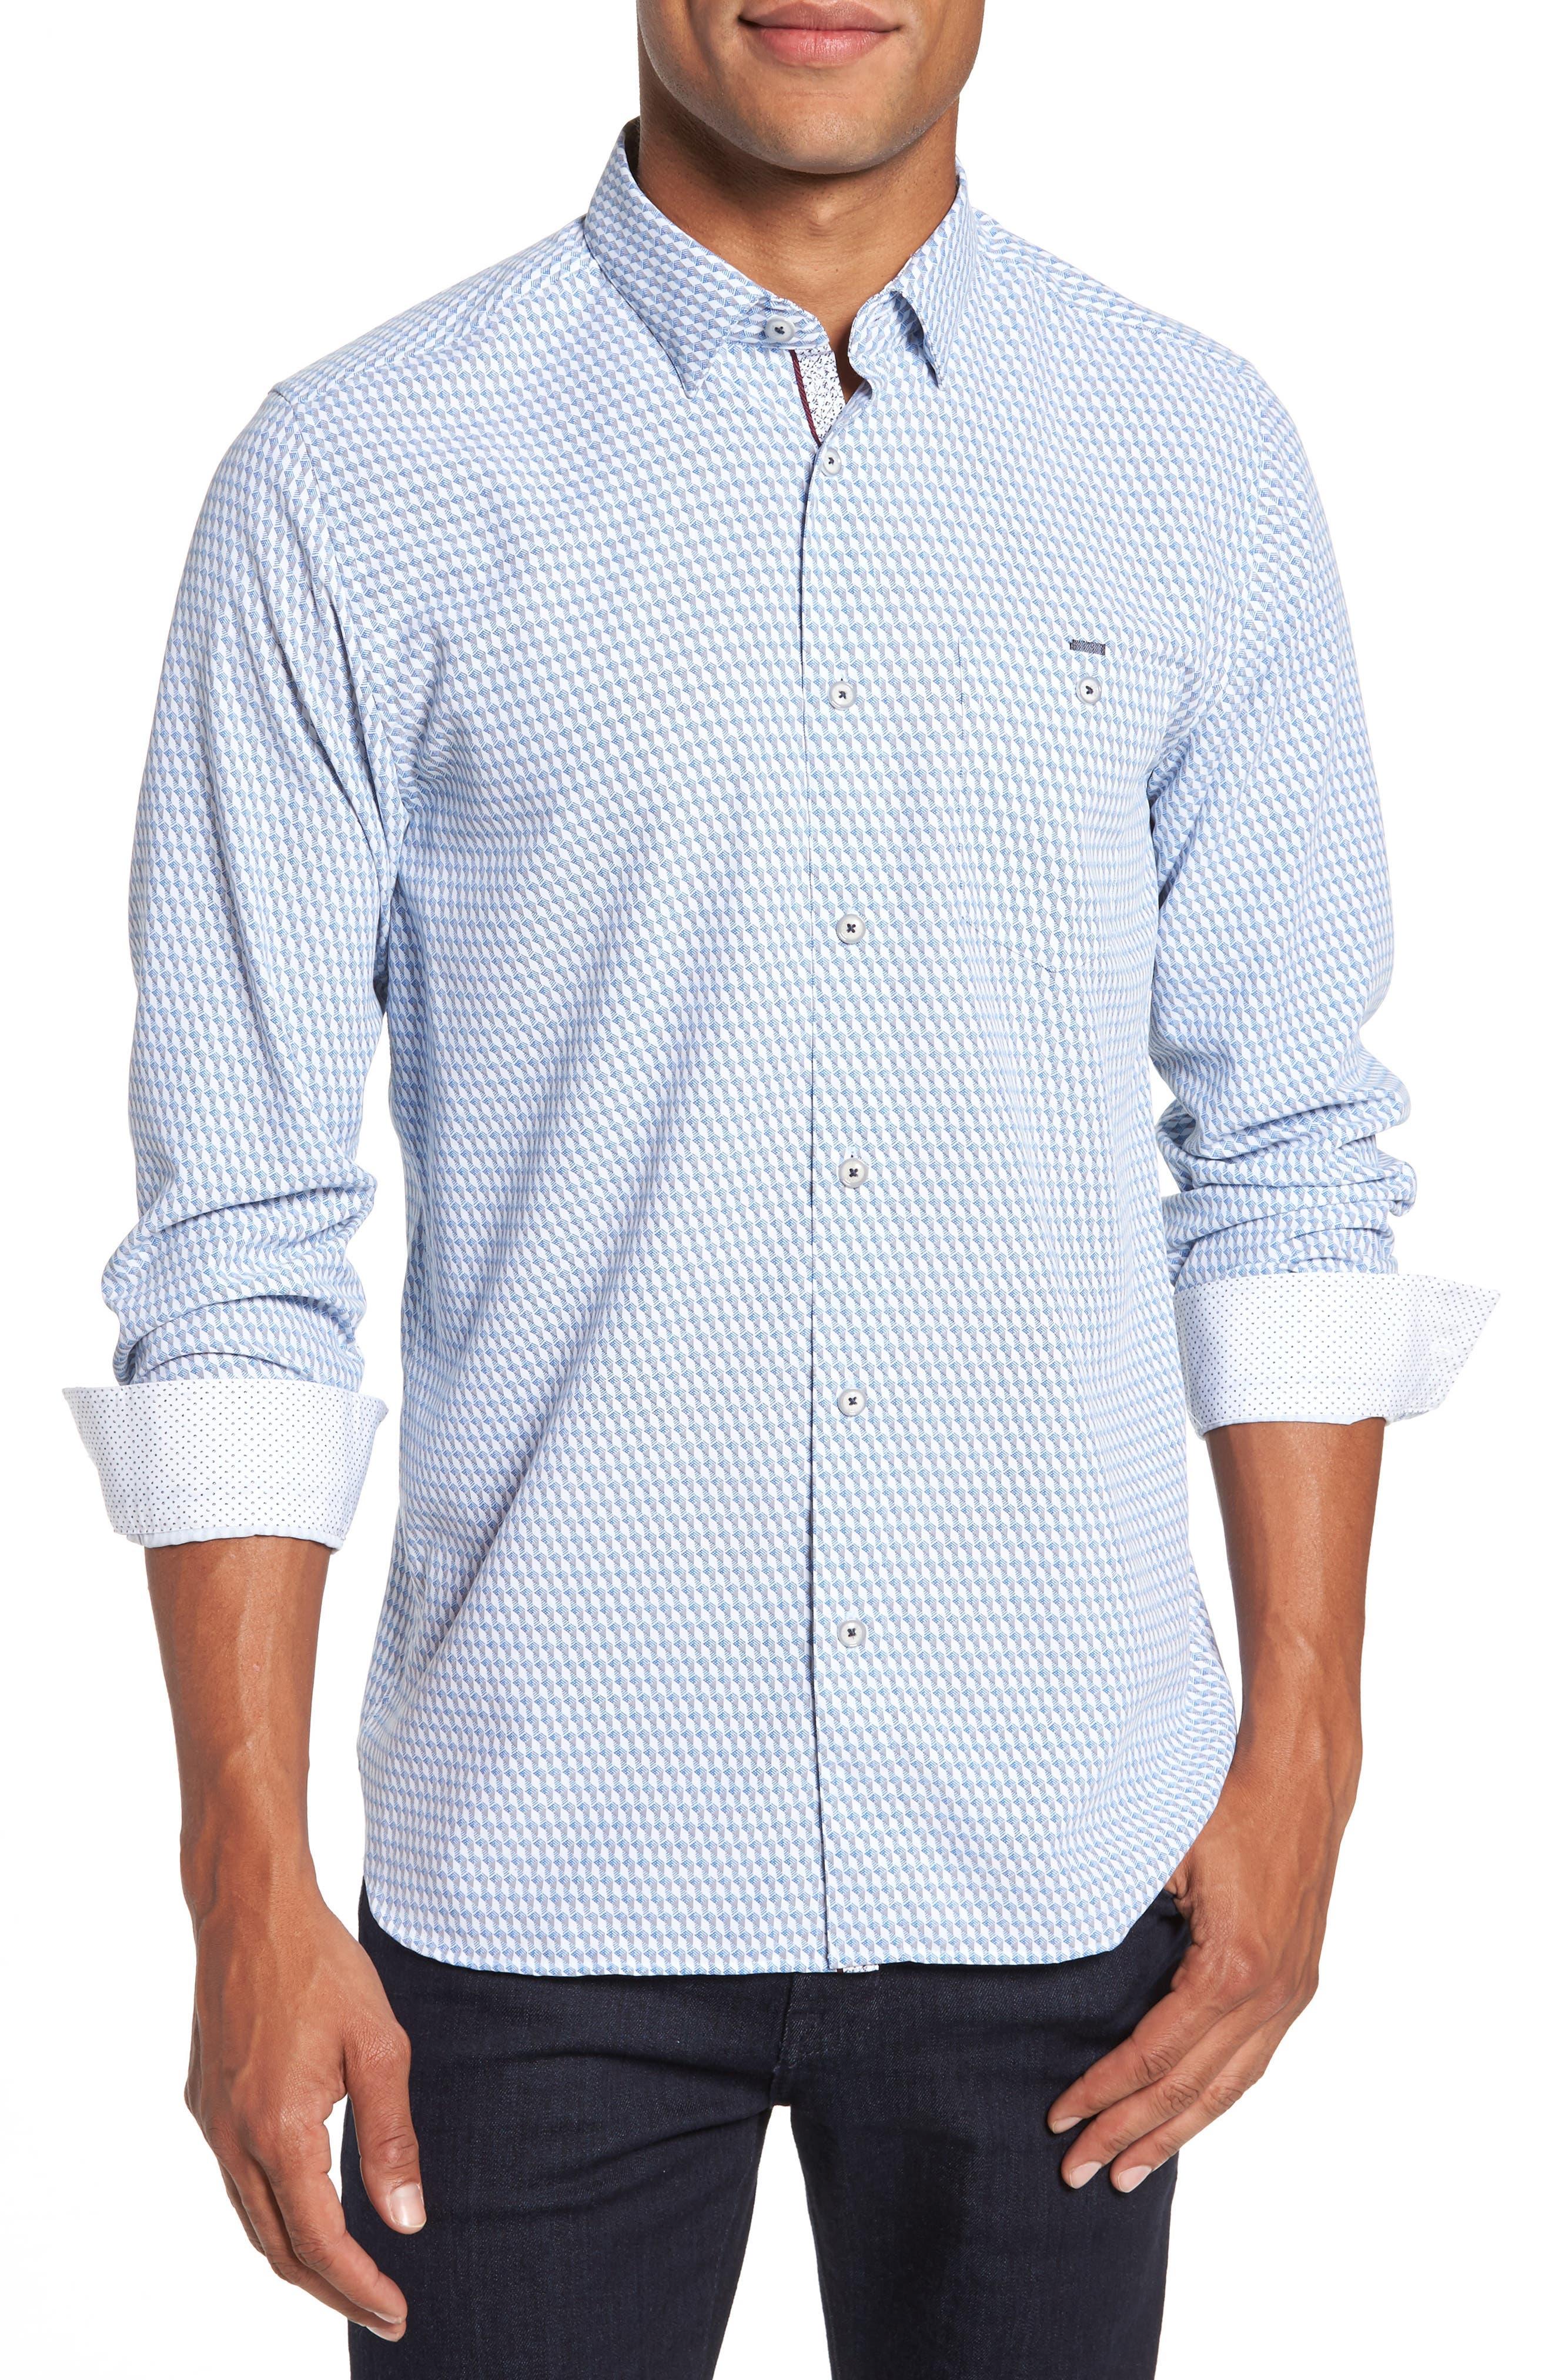 Cheap Sale Footlocker Finishline Outlet Cheap Authentic Wyne Slim Fit Polynosic Geo Print Sport Shirt RFgkm9m